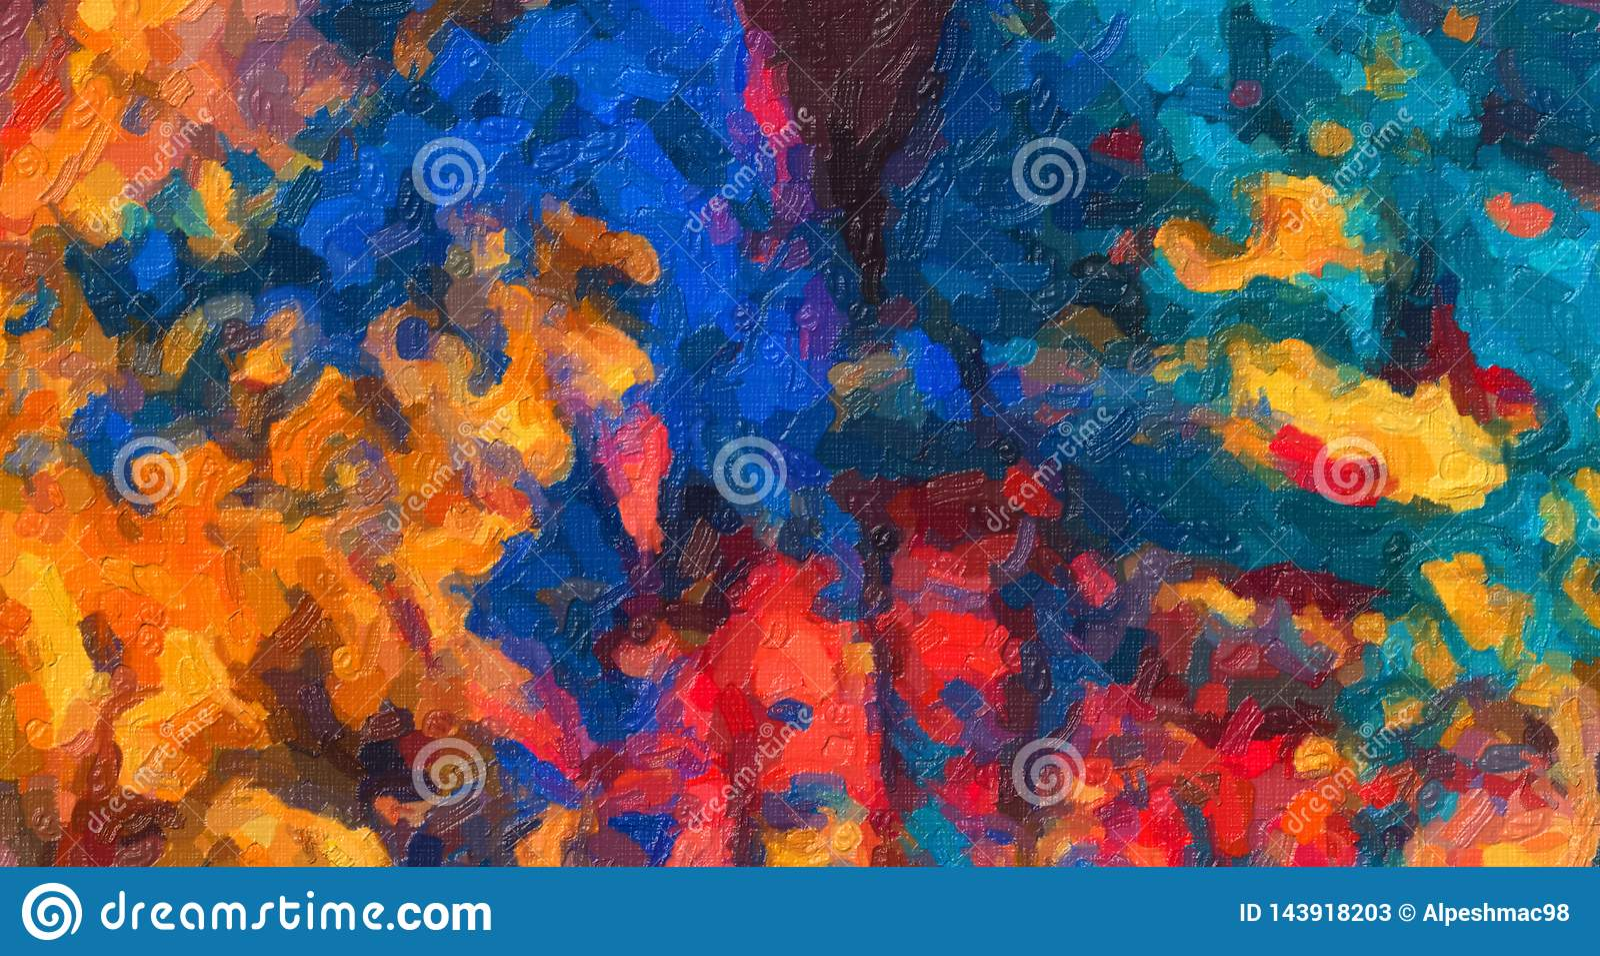 Extracto Holi Art Impasto Painting, arte de Holi, pintura colorida